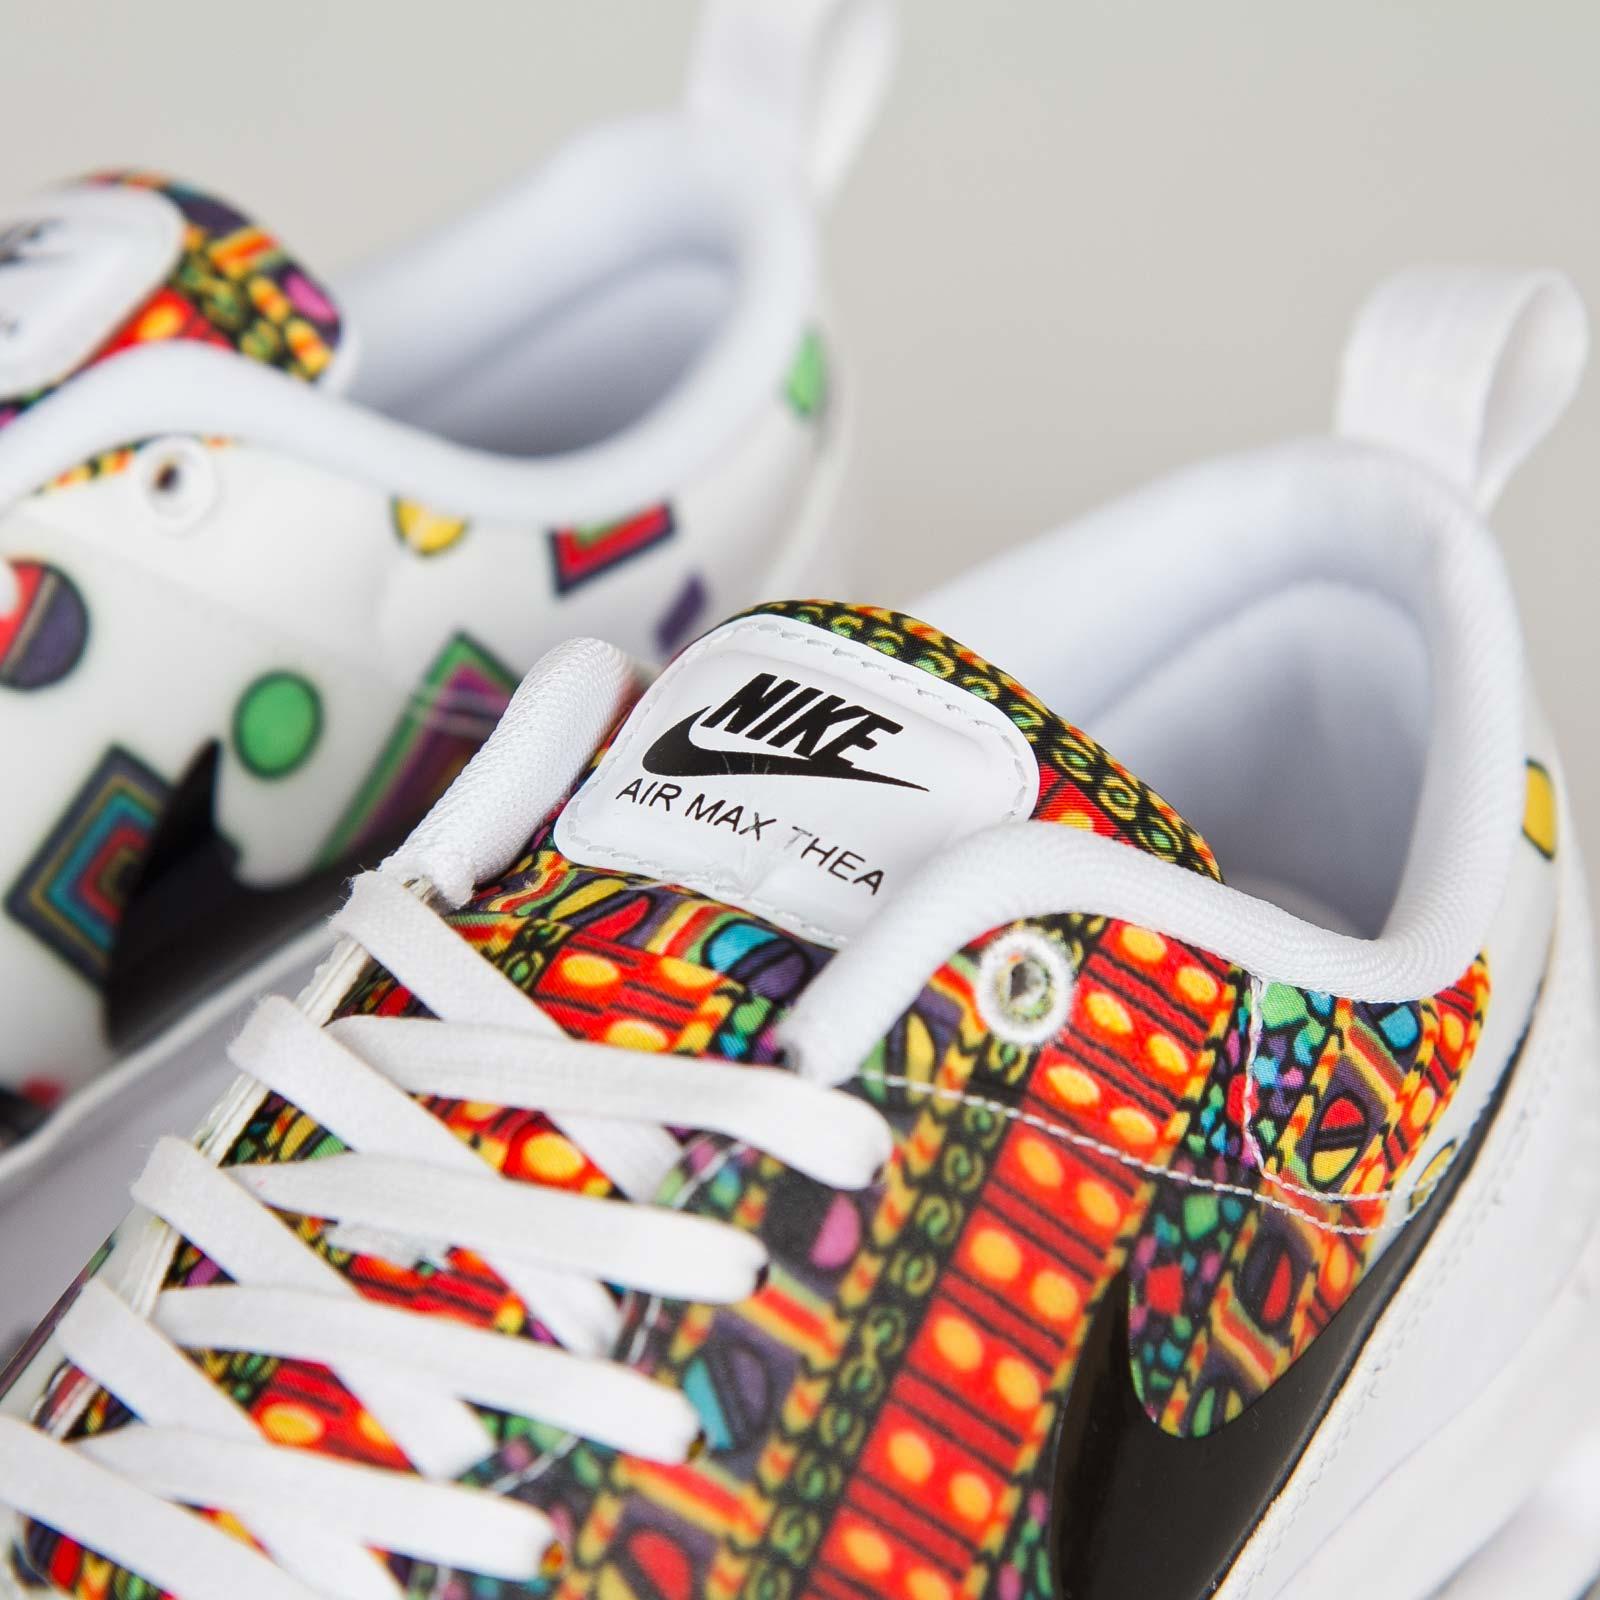 c0d096664c Nike Wmns Air Max Thea Lib QS - 746082-100 - Sneakersnstuff | sneakers &  streetwear online since 1999